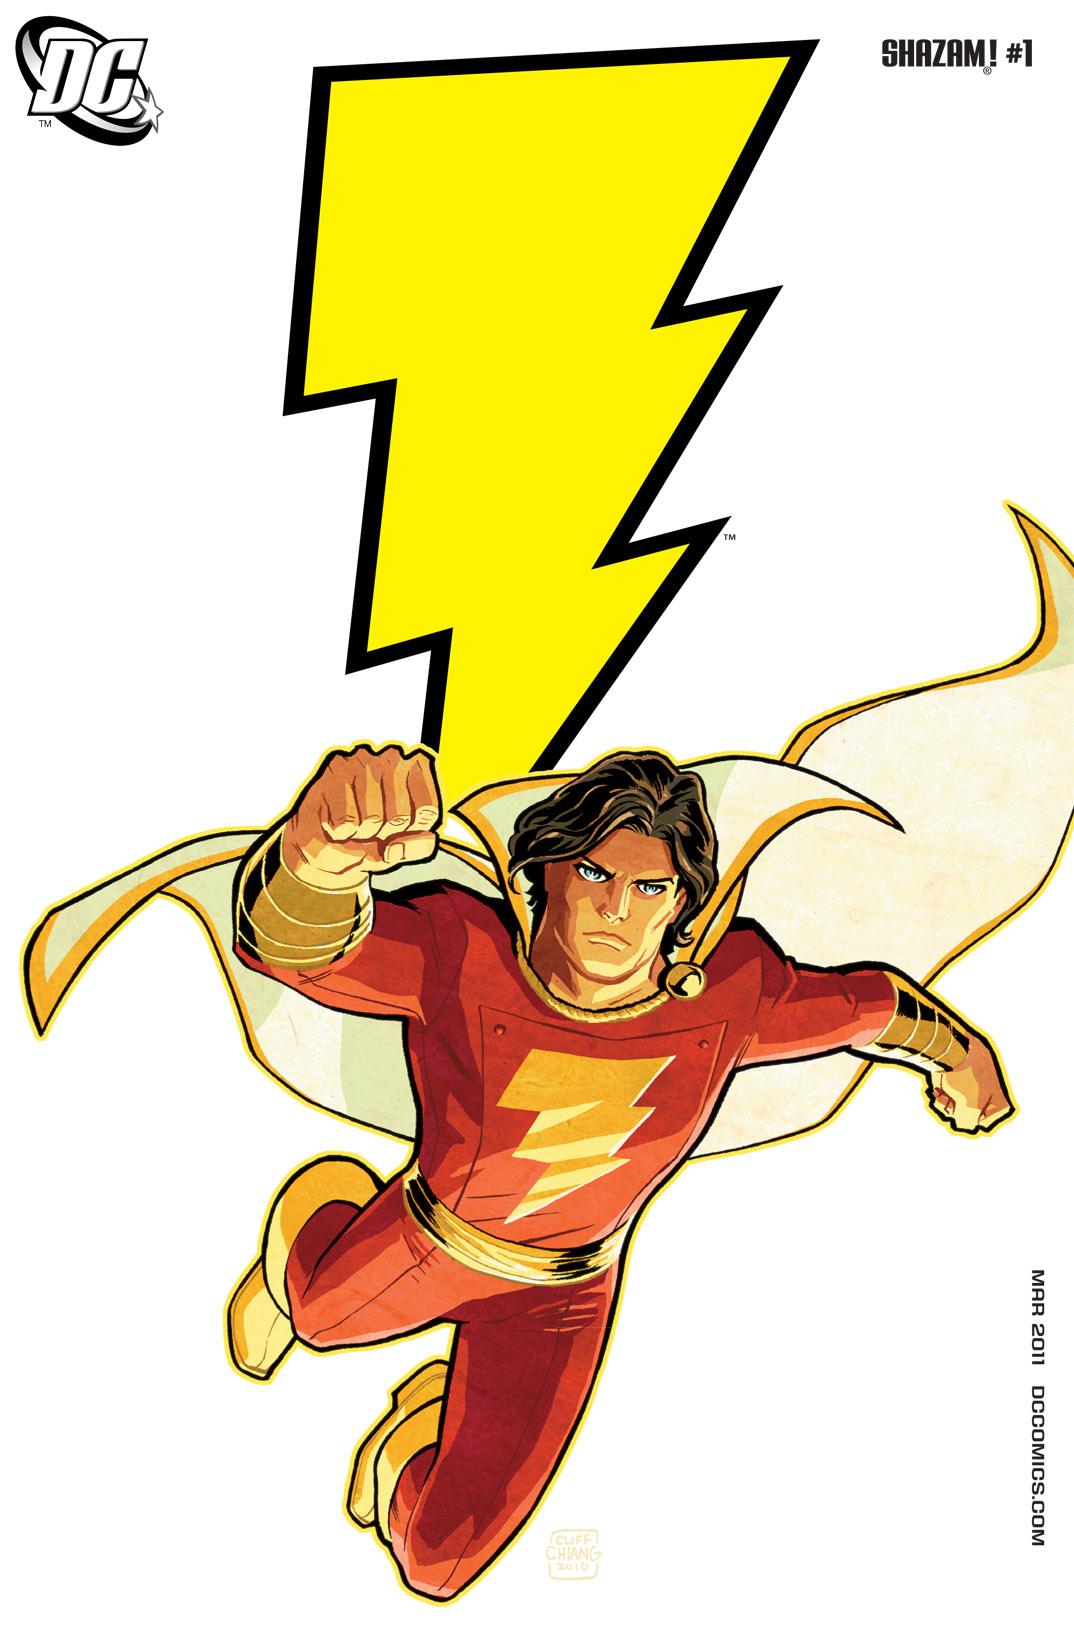 Read online Shazam! (2011) comic -  Issue #1 - 1